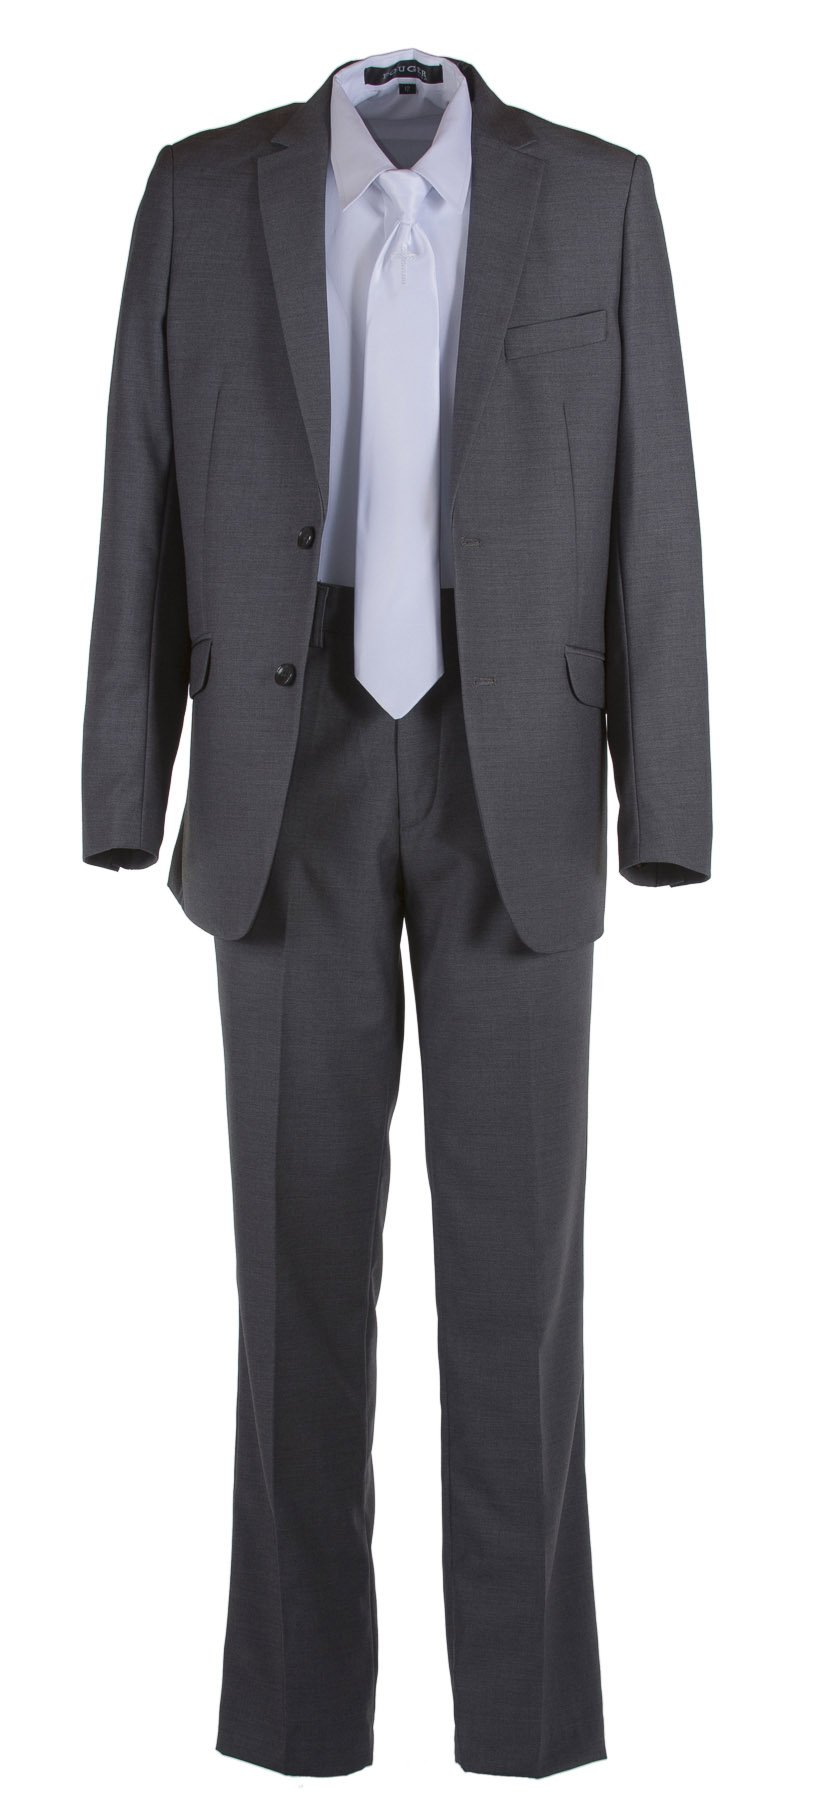 Tuxgear Boys Dark Grey Slim Fit Communion Suit With Religious Cross Dress Tie (7 Boys)